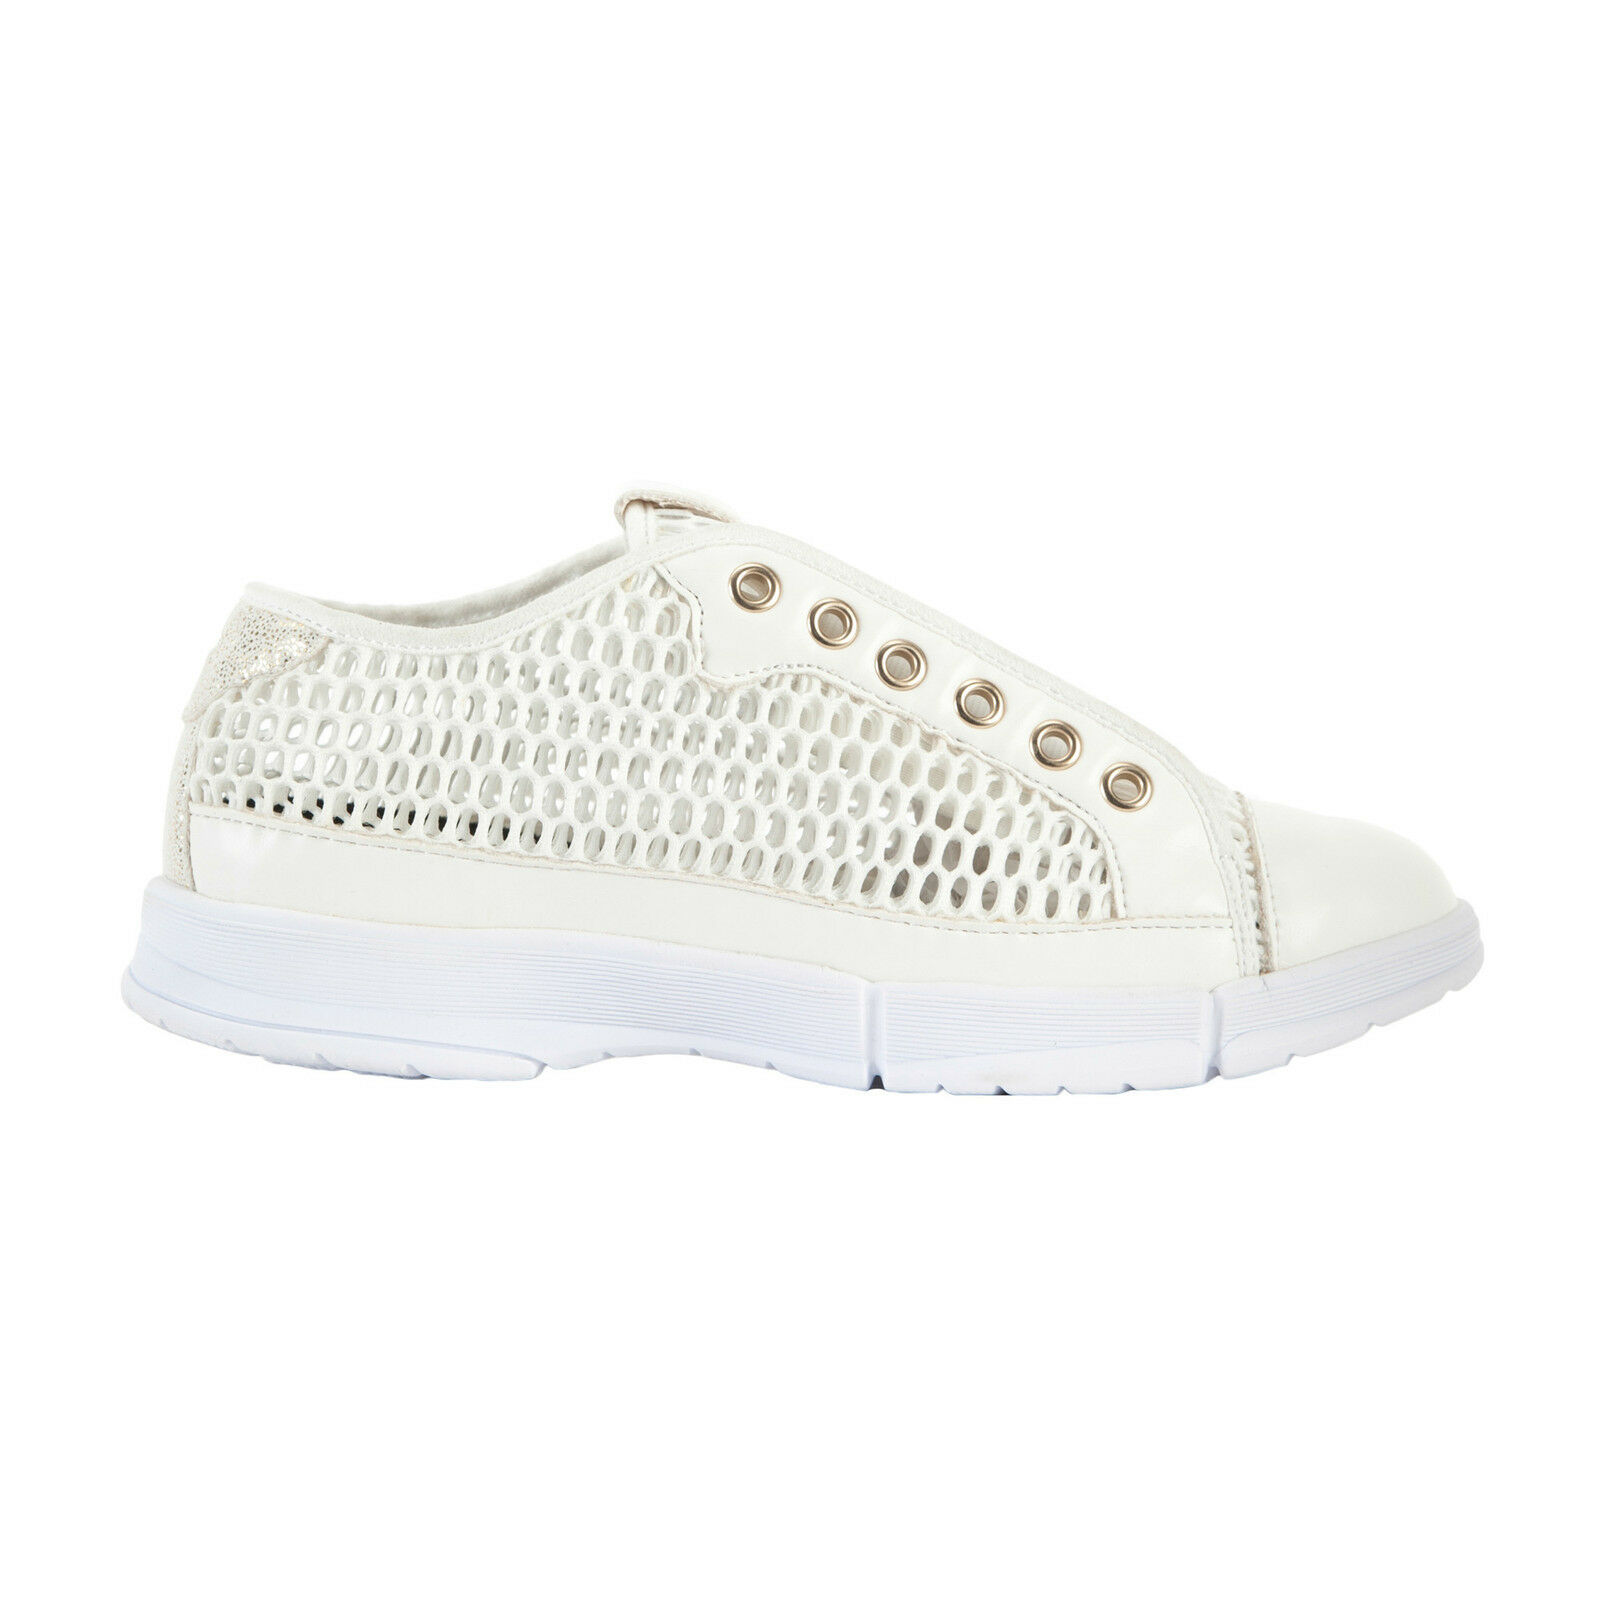 FROTdy Scarpa Damenschuhe S6WFSL1W Sneaker in rete di mesh colore bianco NEW